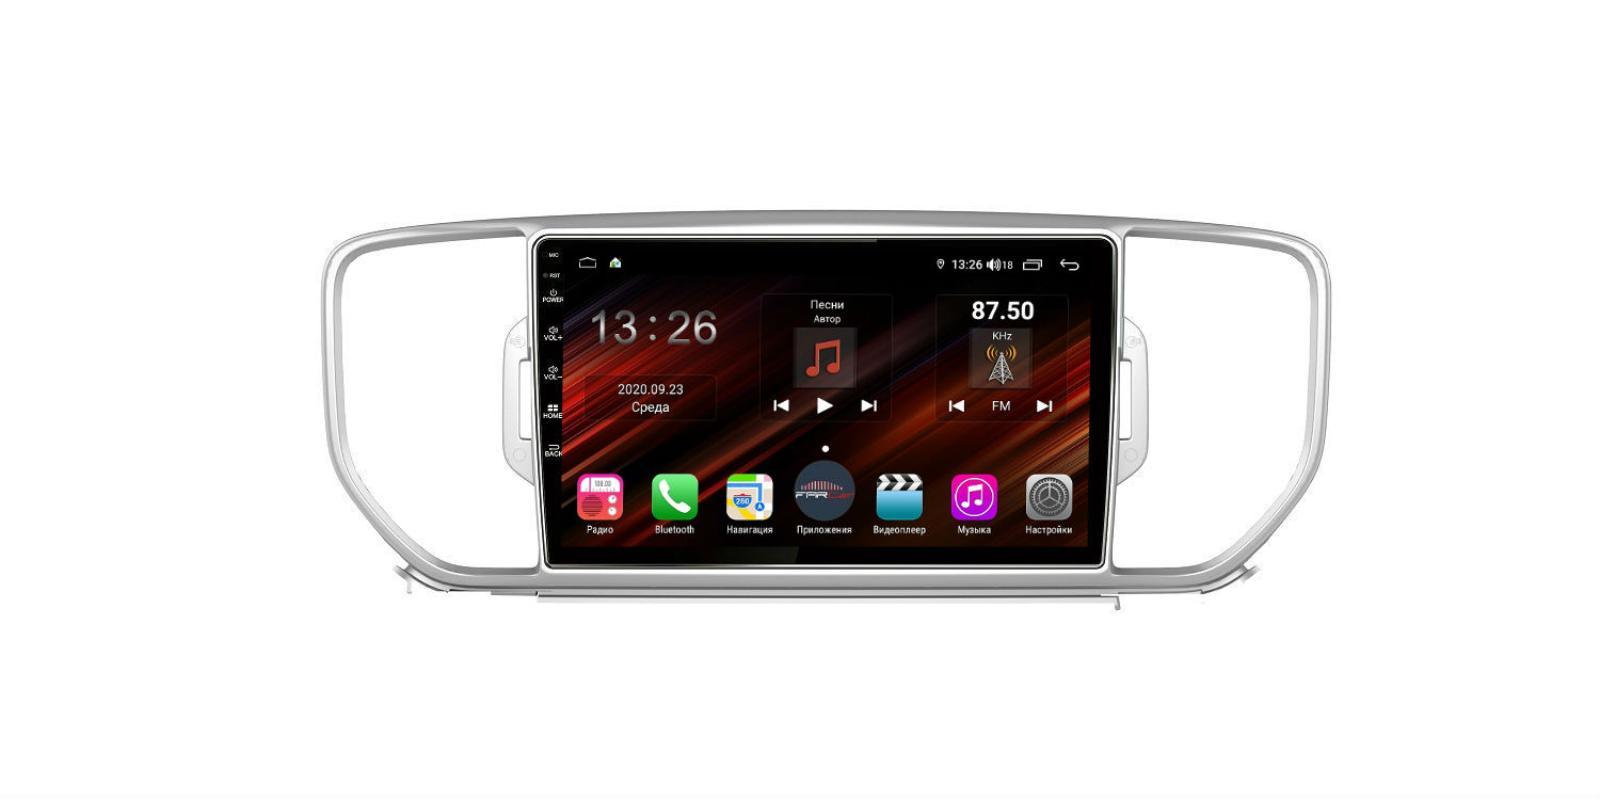 Штатная магнитола FarCar s400 Super HD для KIA Sportage на Android (XH576R) (+ Камера заднего вида в подарок!)